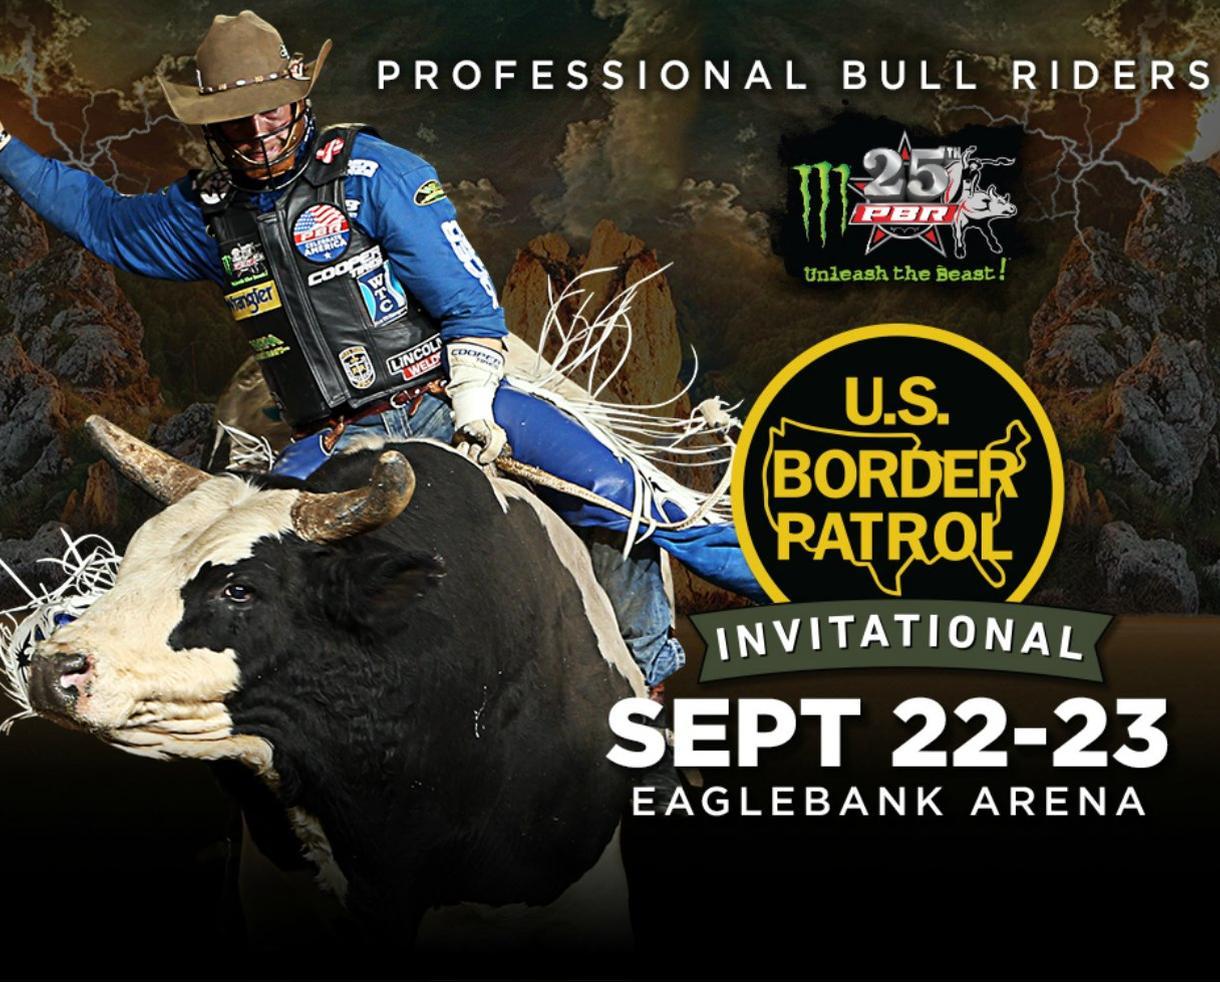 25th Professional Bull Riders Invitational at EagleBank Arena